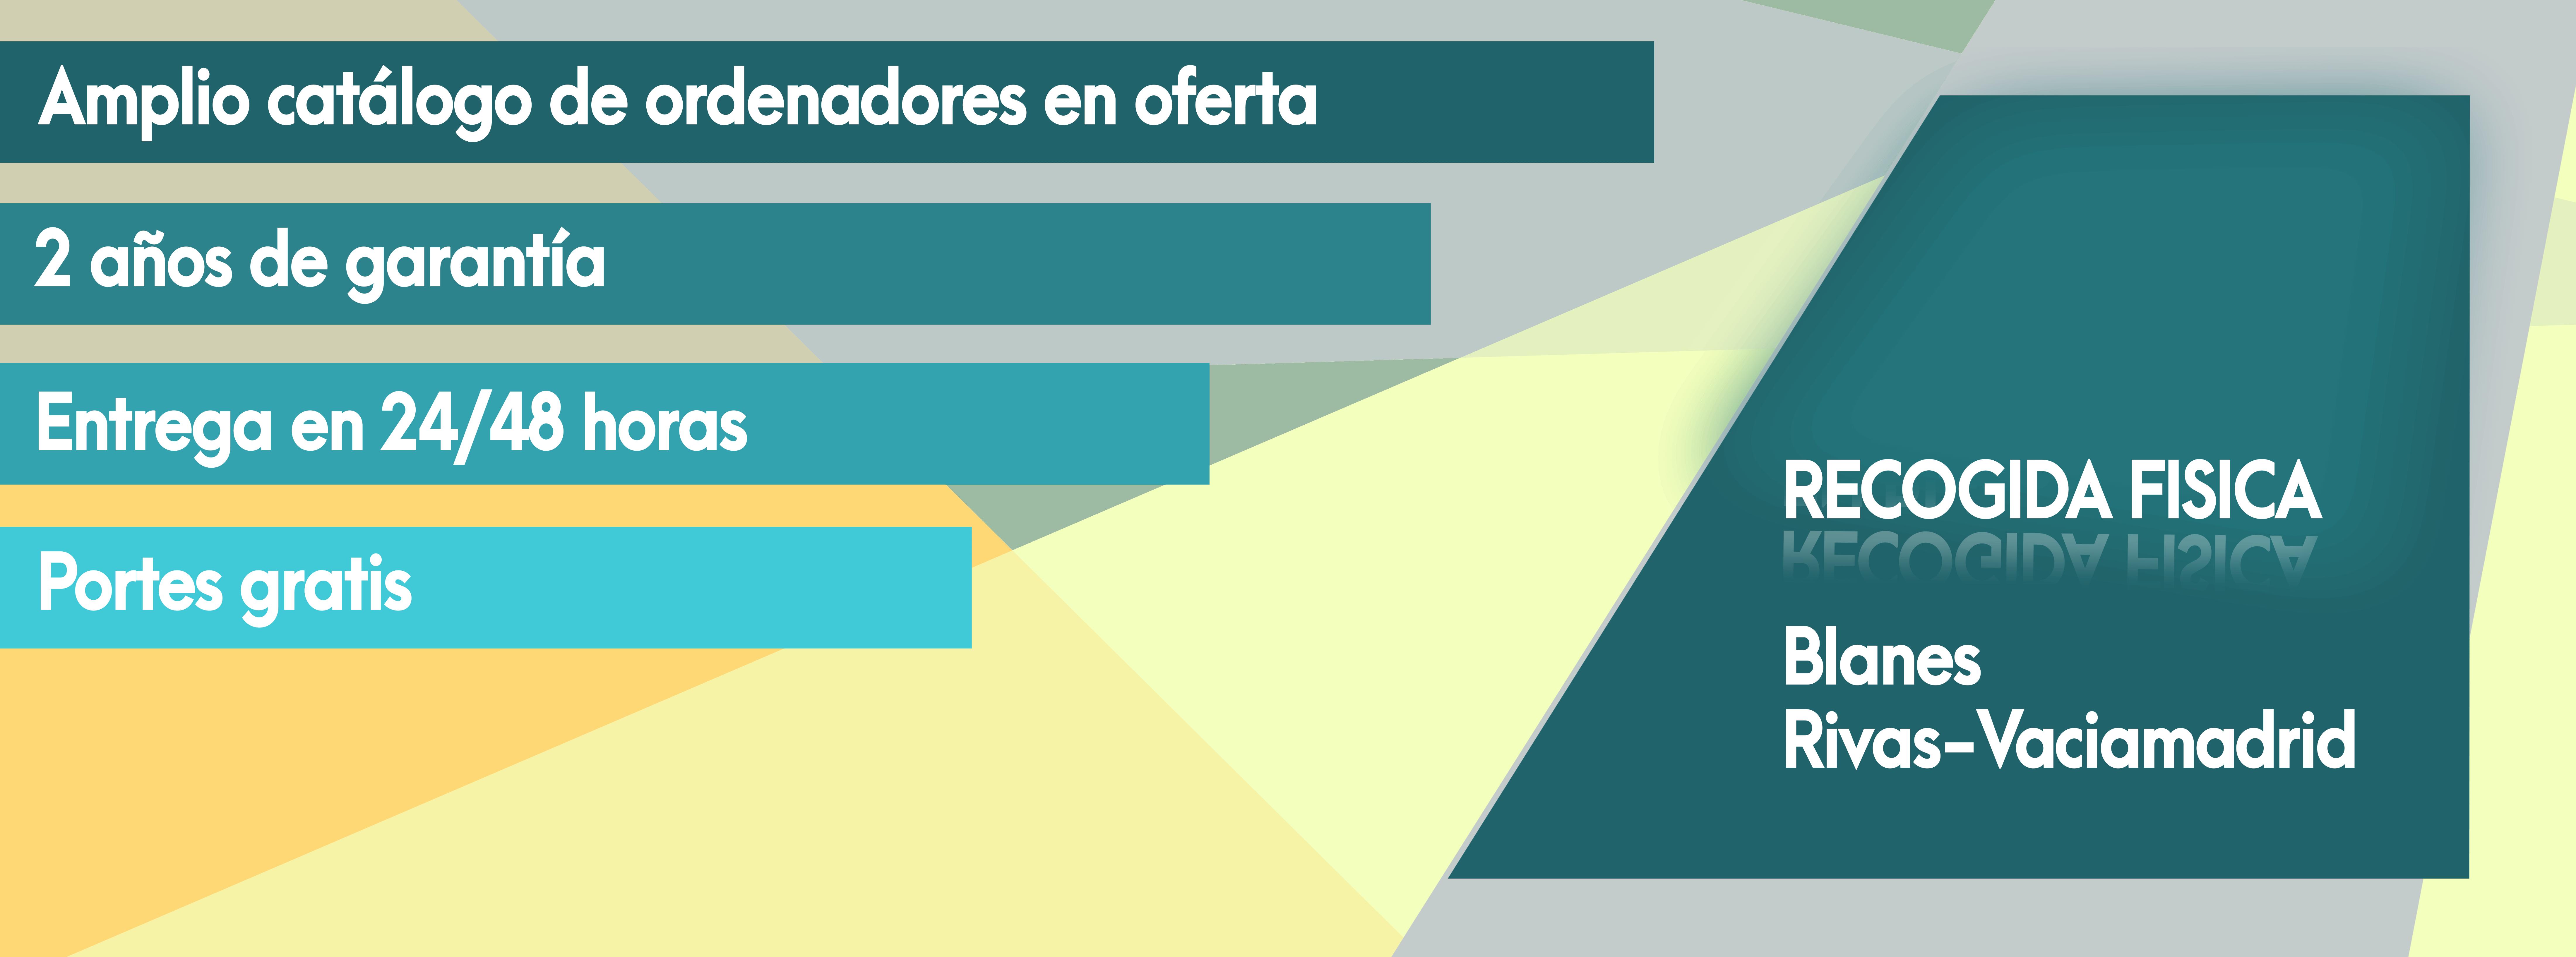 banner ofertas unicas junio 2019 (1).gif